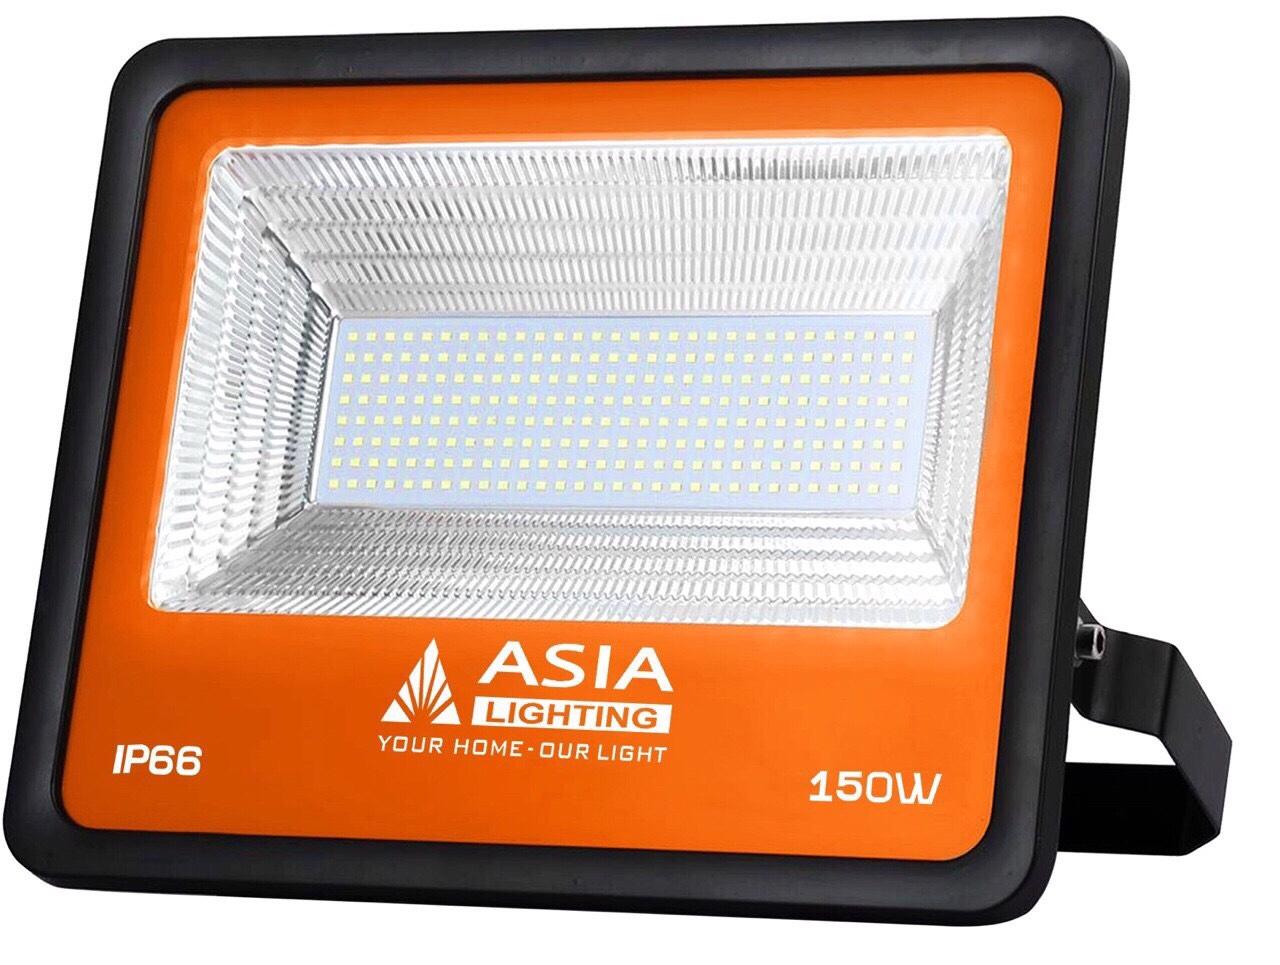 Đèn pha Led 150W Asia – vỏ cam